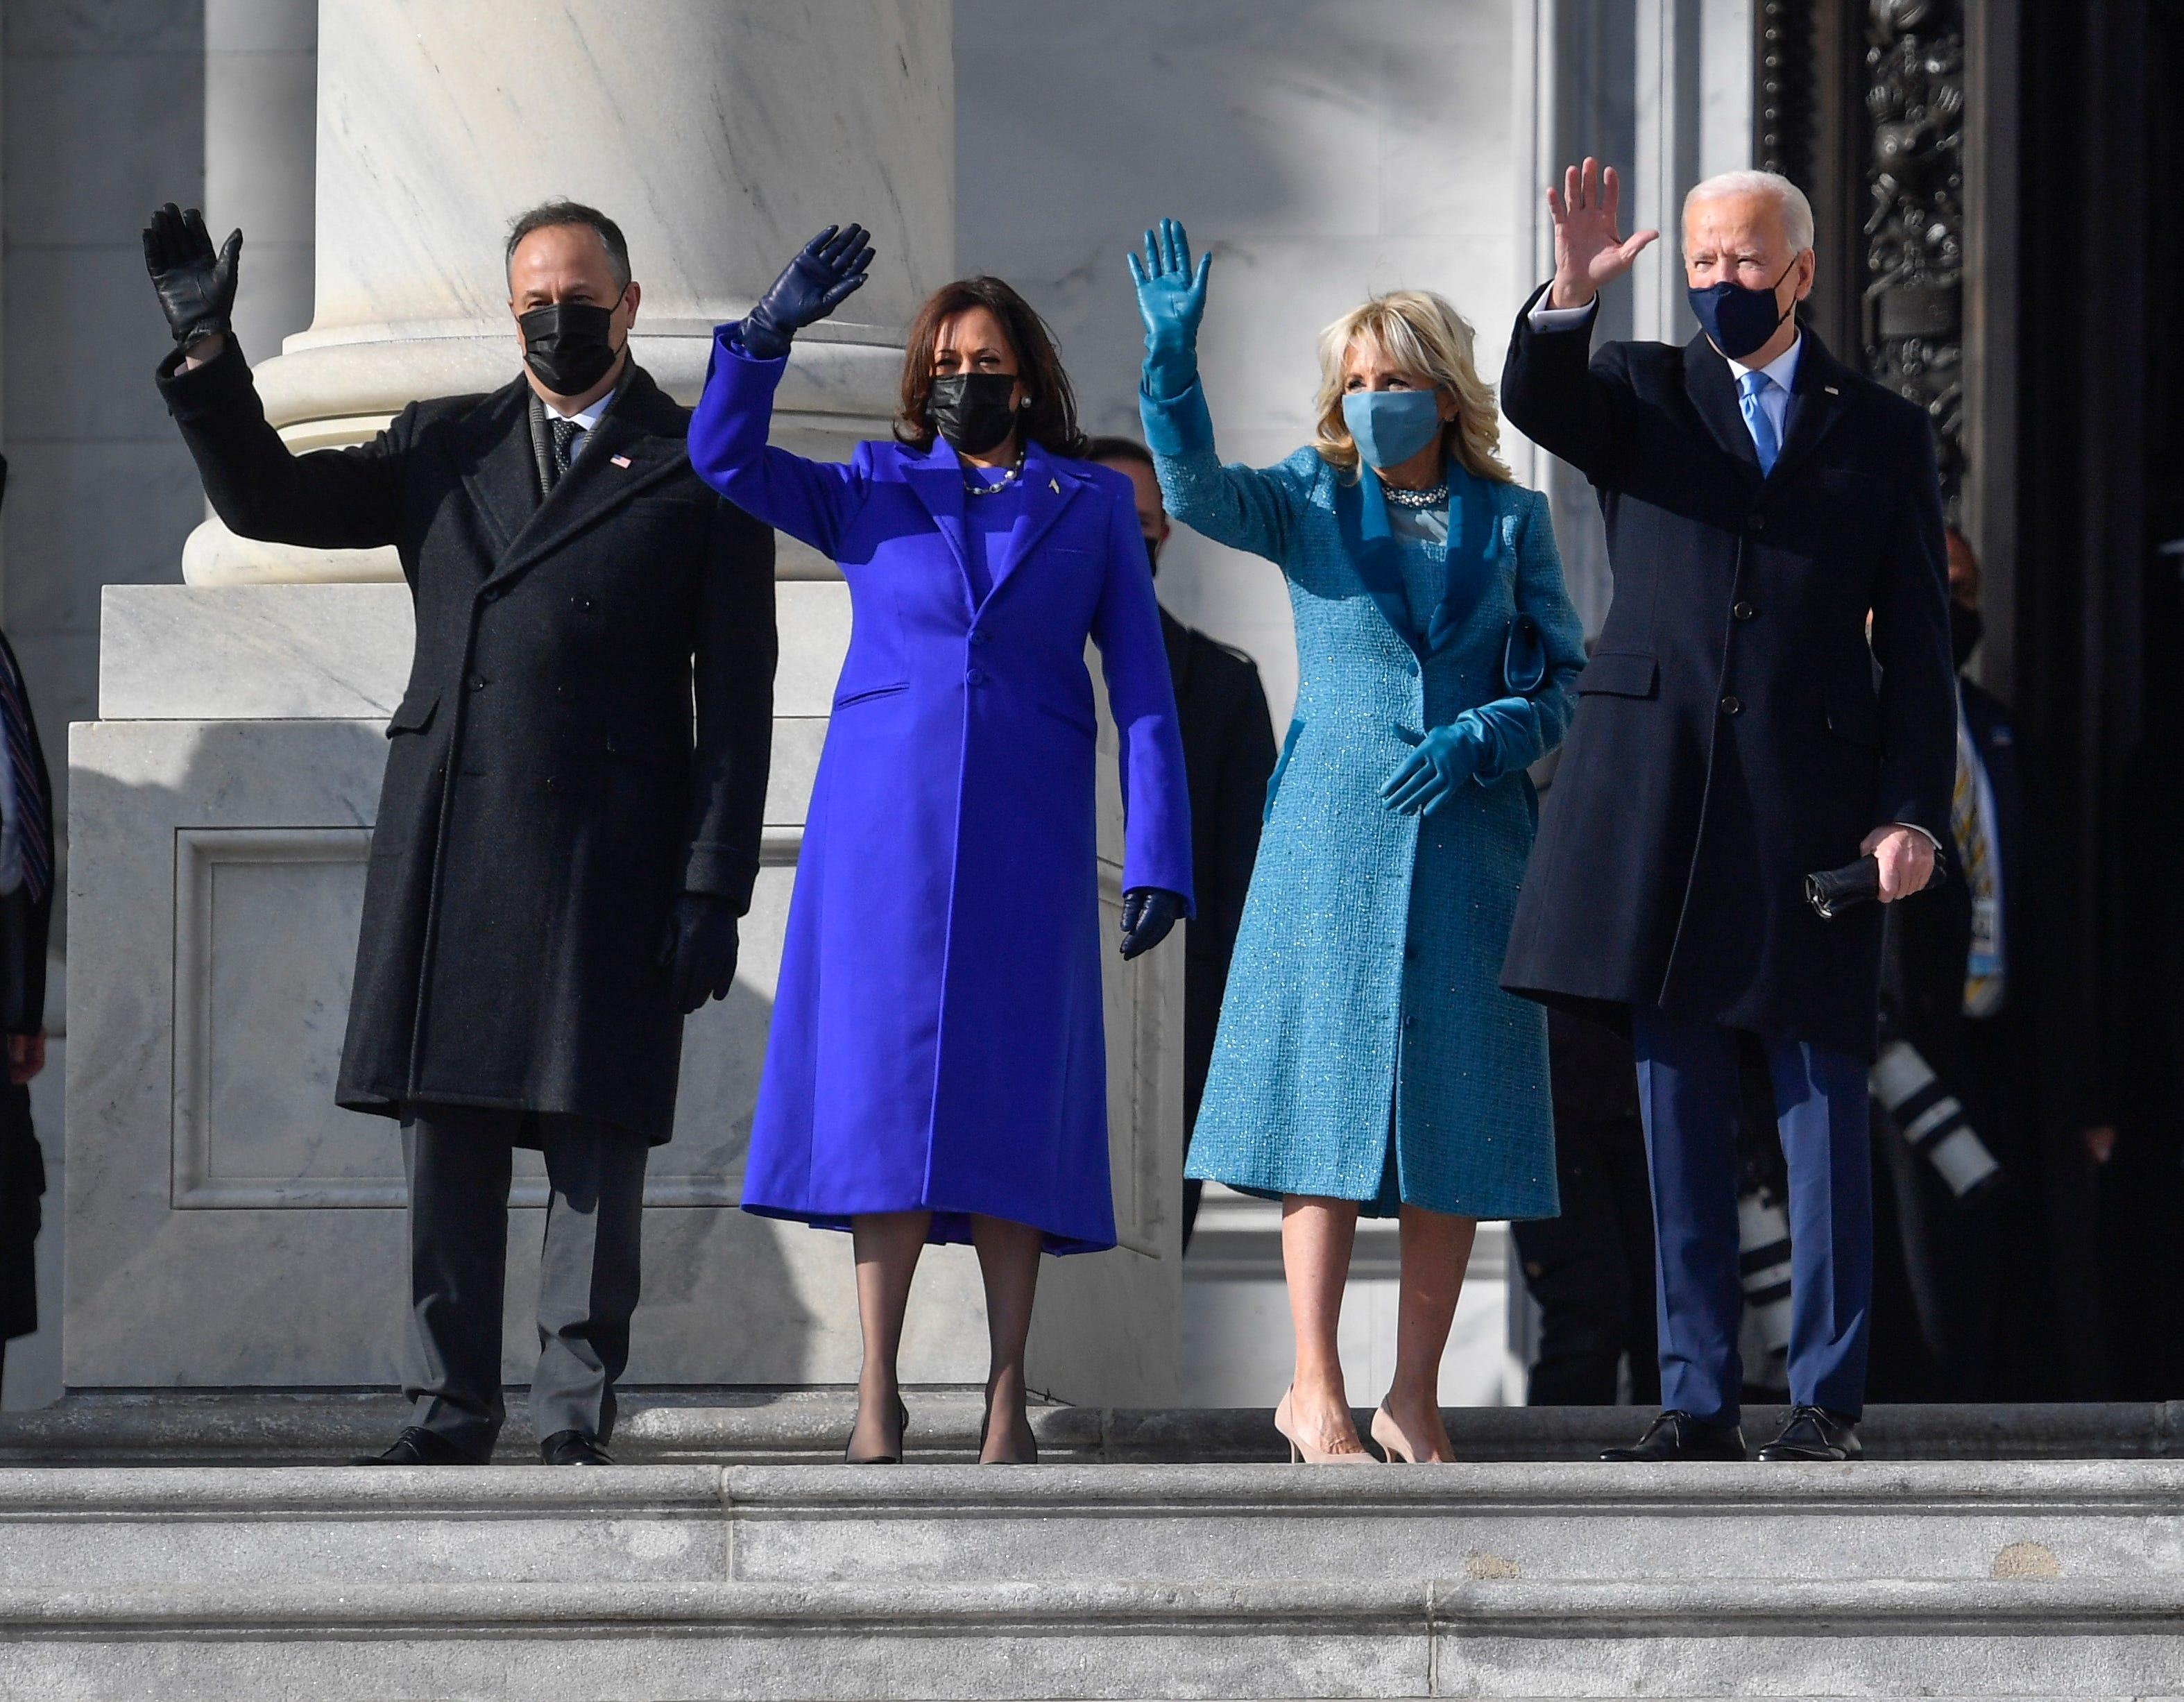 Doug Emhoff, Vice President Kamala Harris, Jill Biden & President Joe Biden